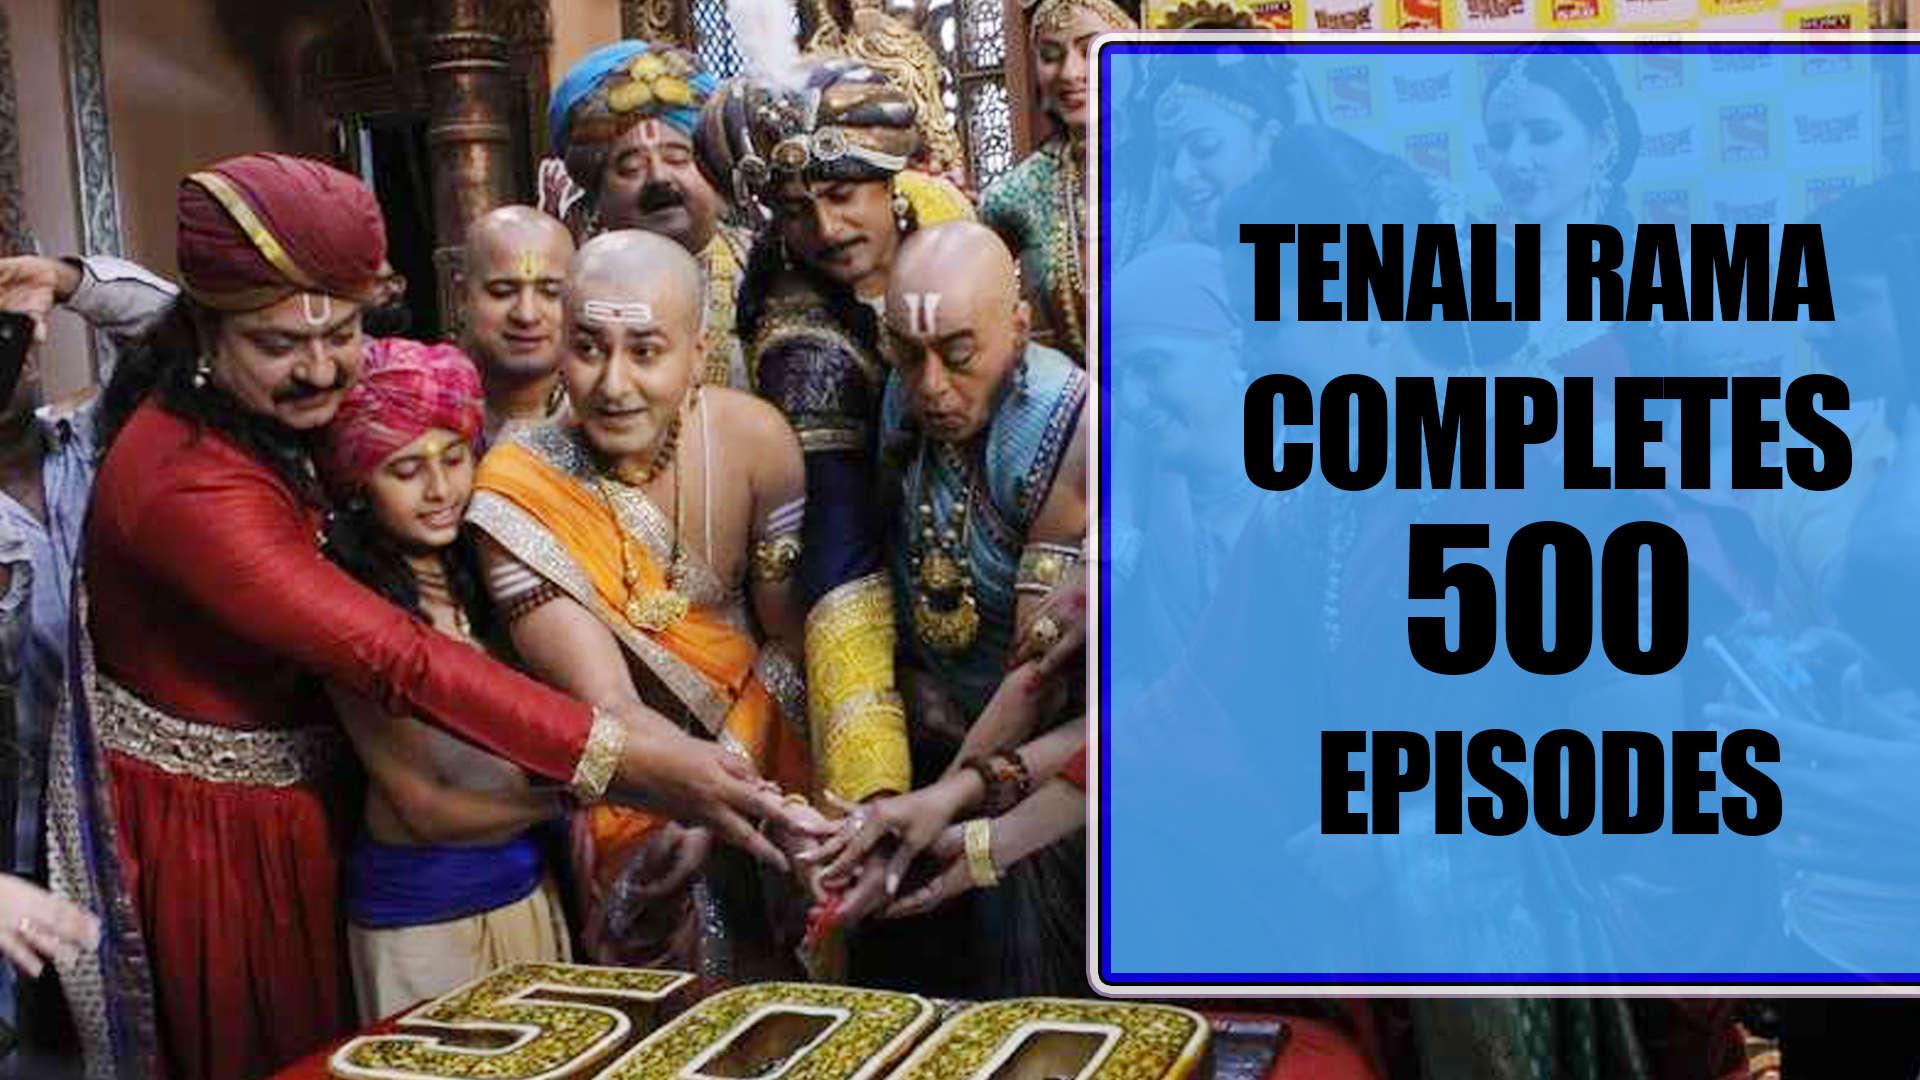 Tenali Rama celebrates the completion of glorious 500 episodes